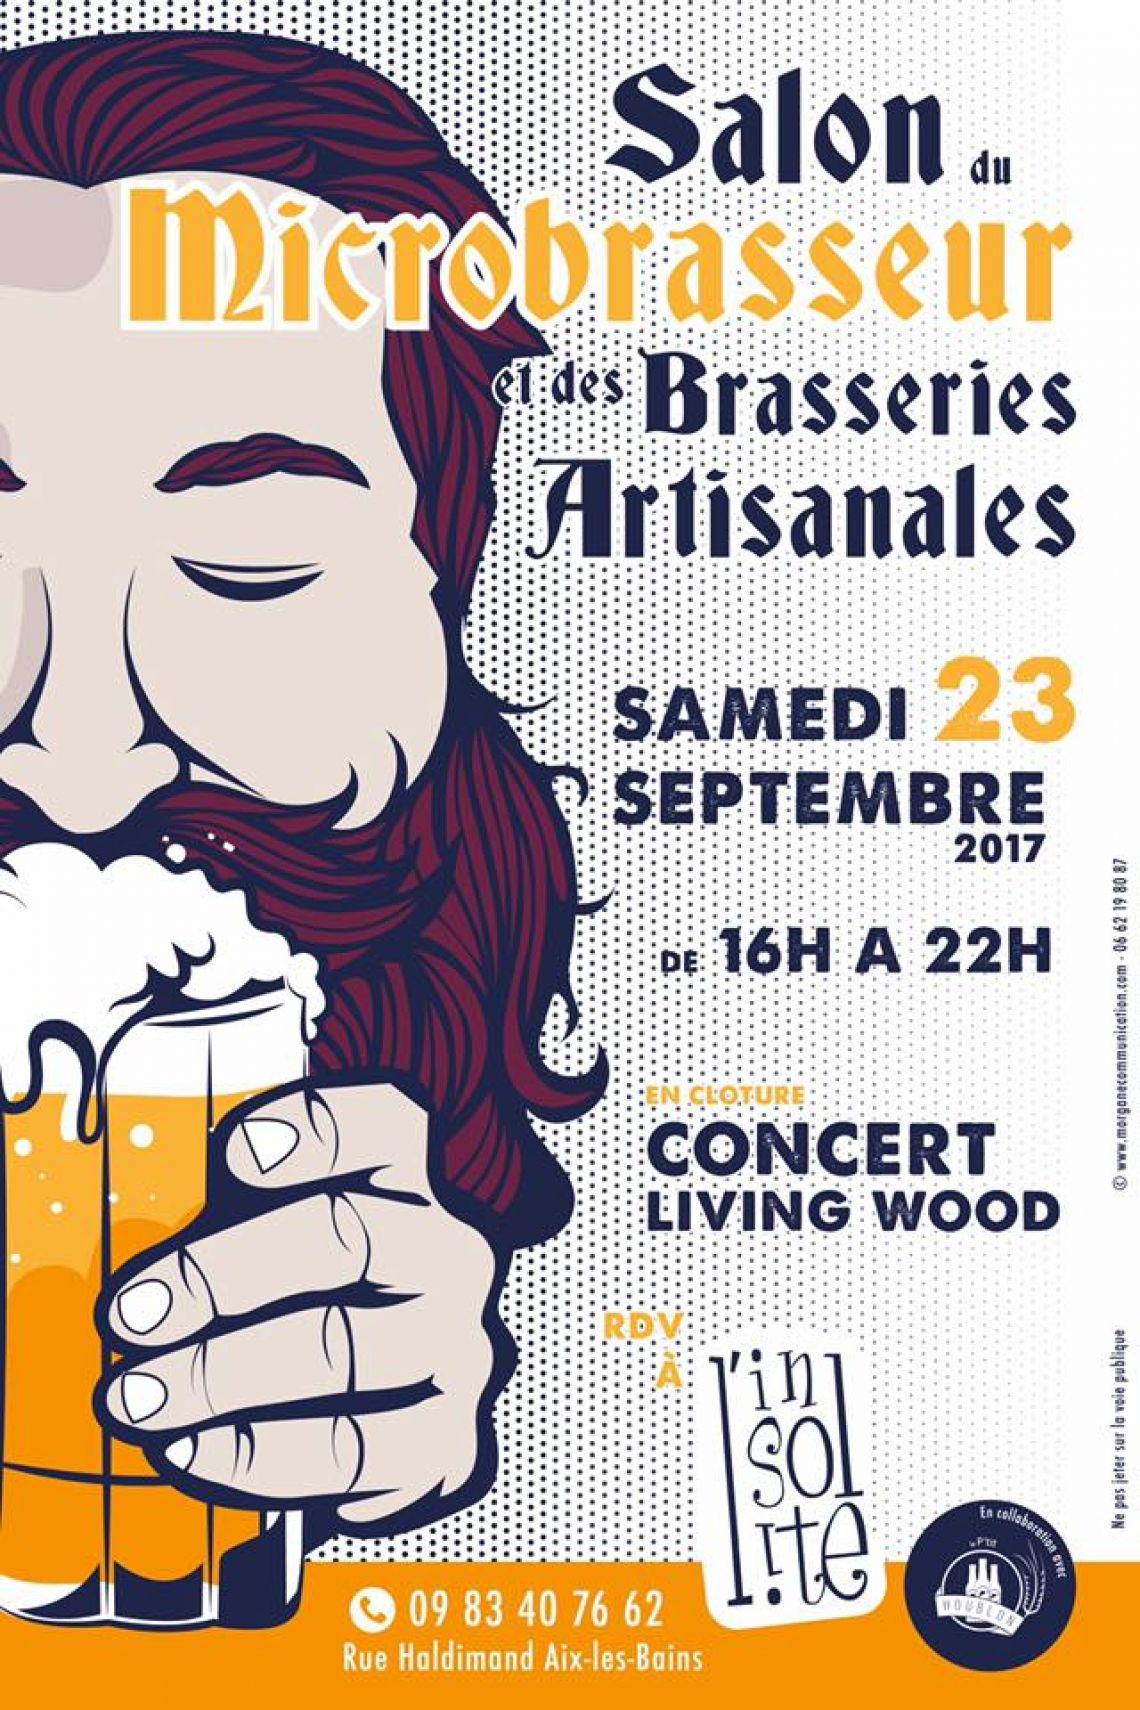 Salon du micro brasseur et brasseries artisanale